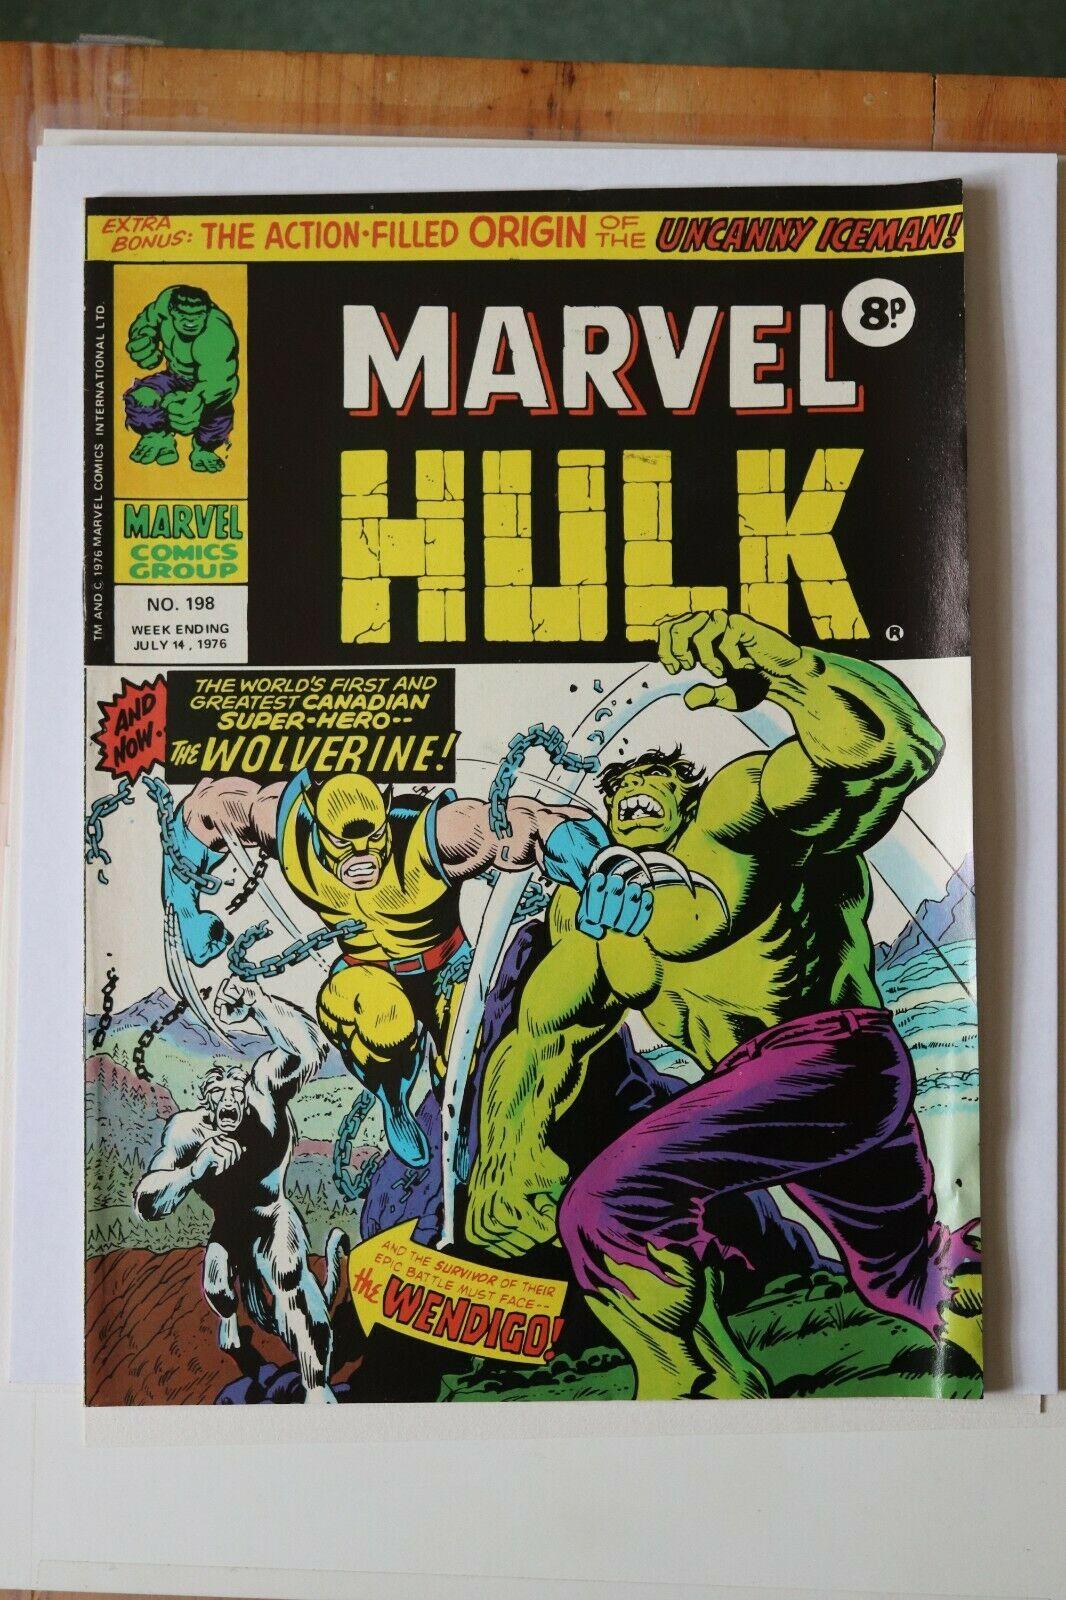 Marvel Mighty World of Marvel #198 UK Hulk #181 1st App of Wolverine